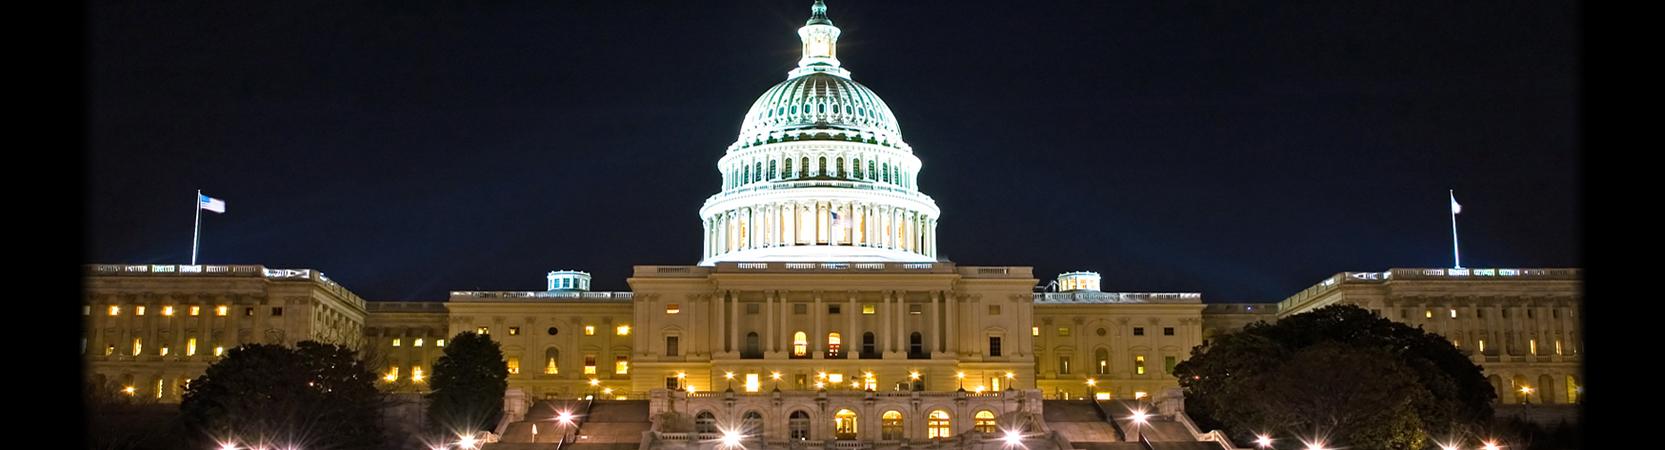 Capitol_at_Night_1665_450.jpg